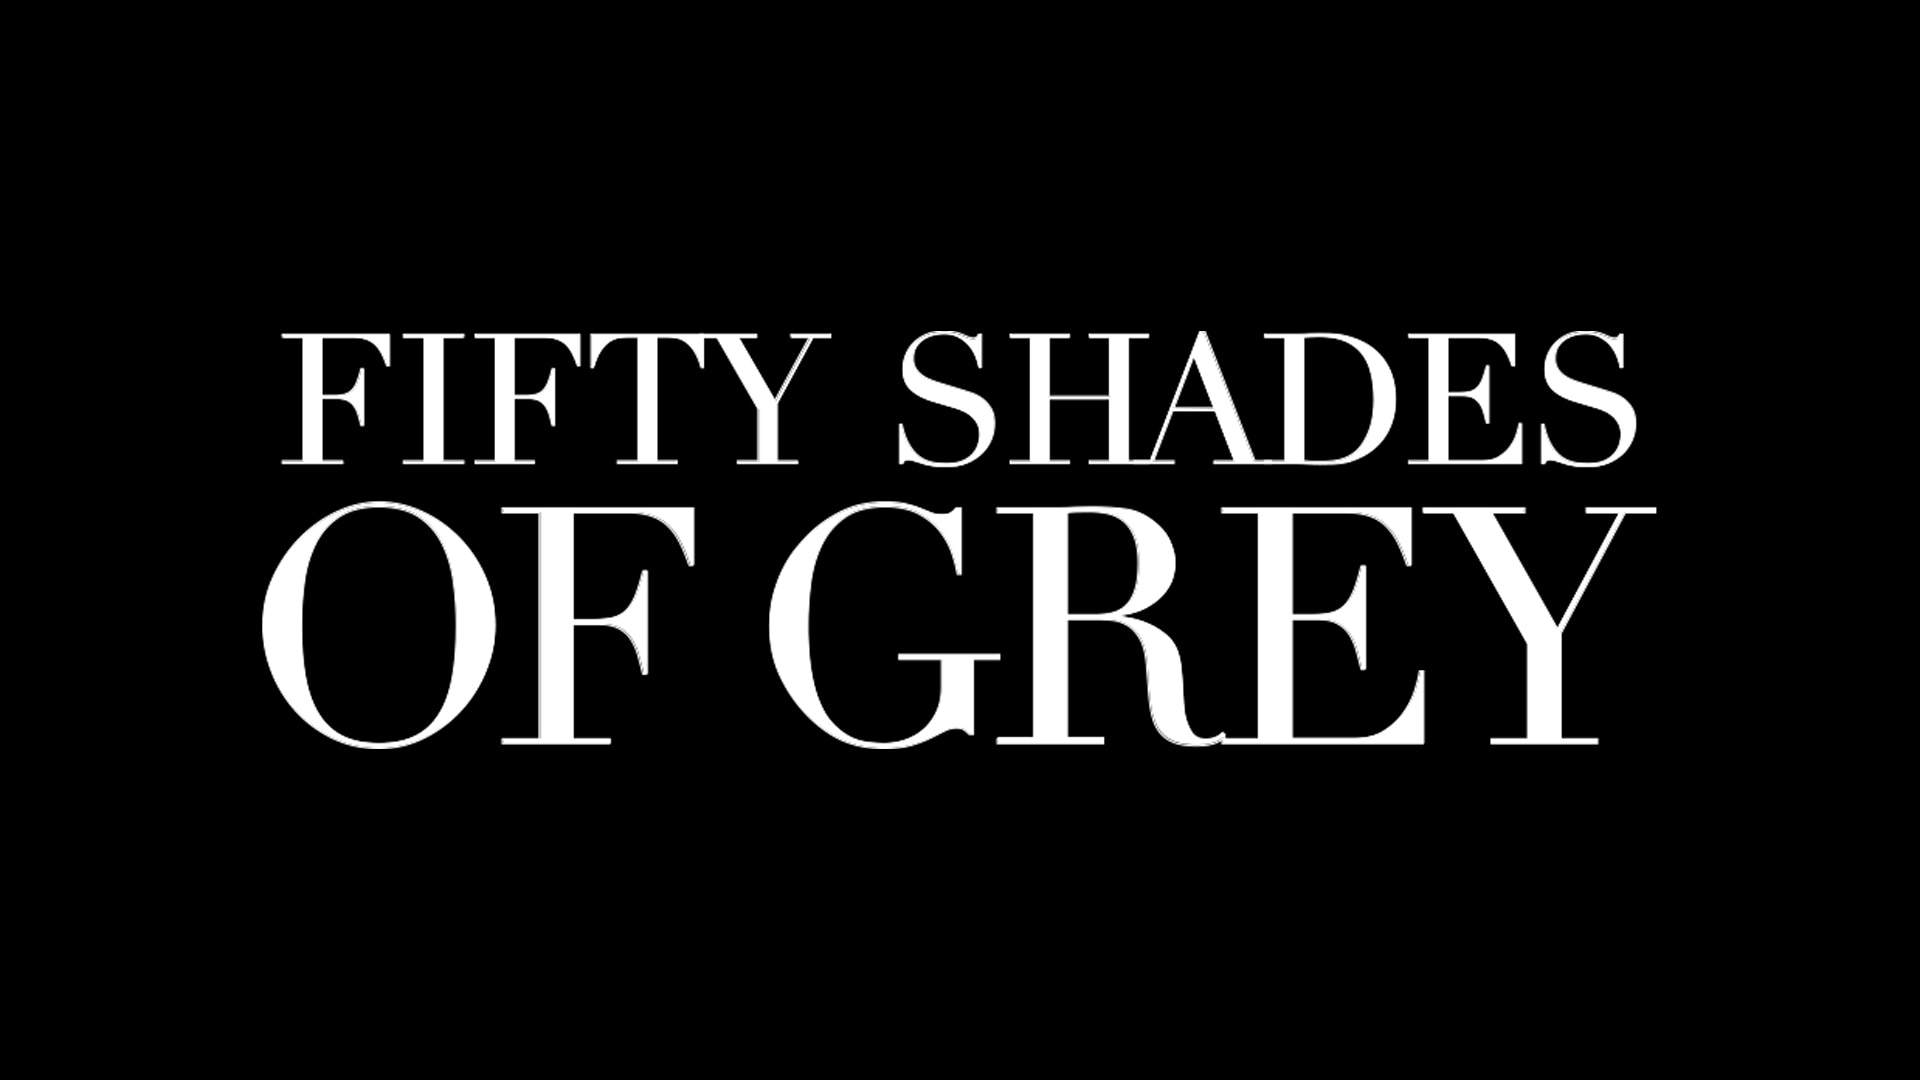 Fifty Shades Of Grey Nbc Com